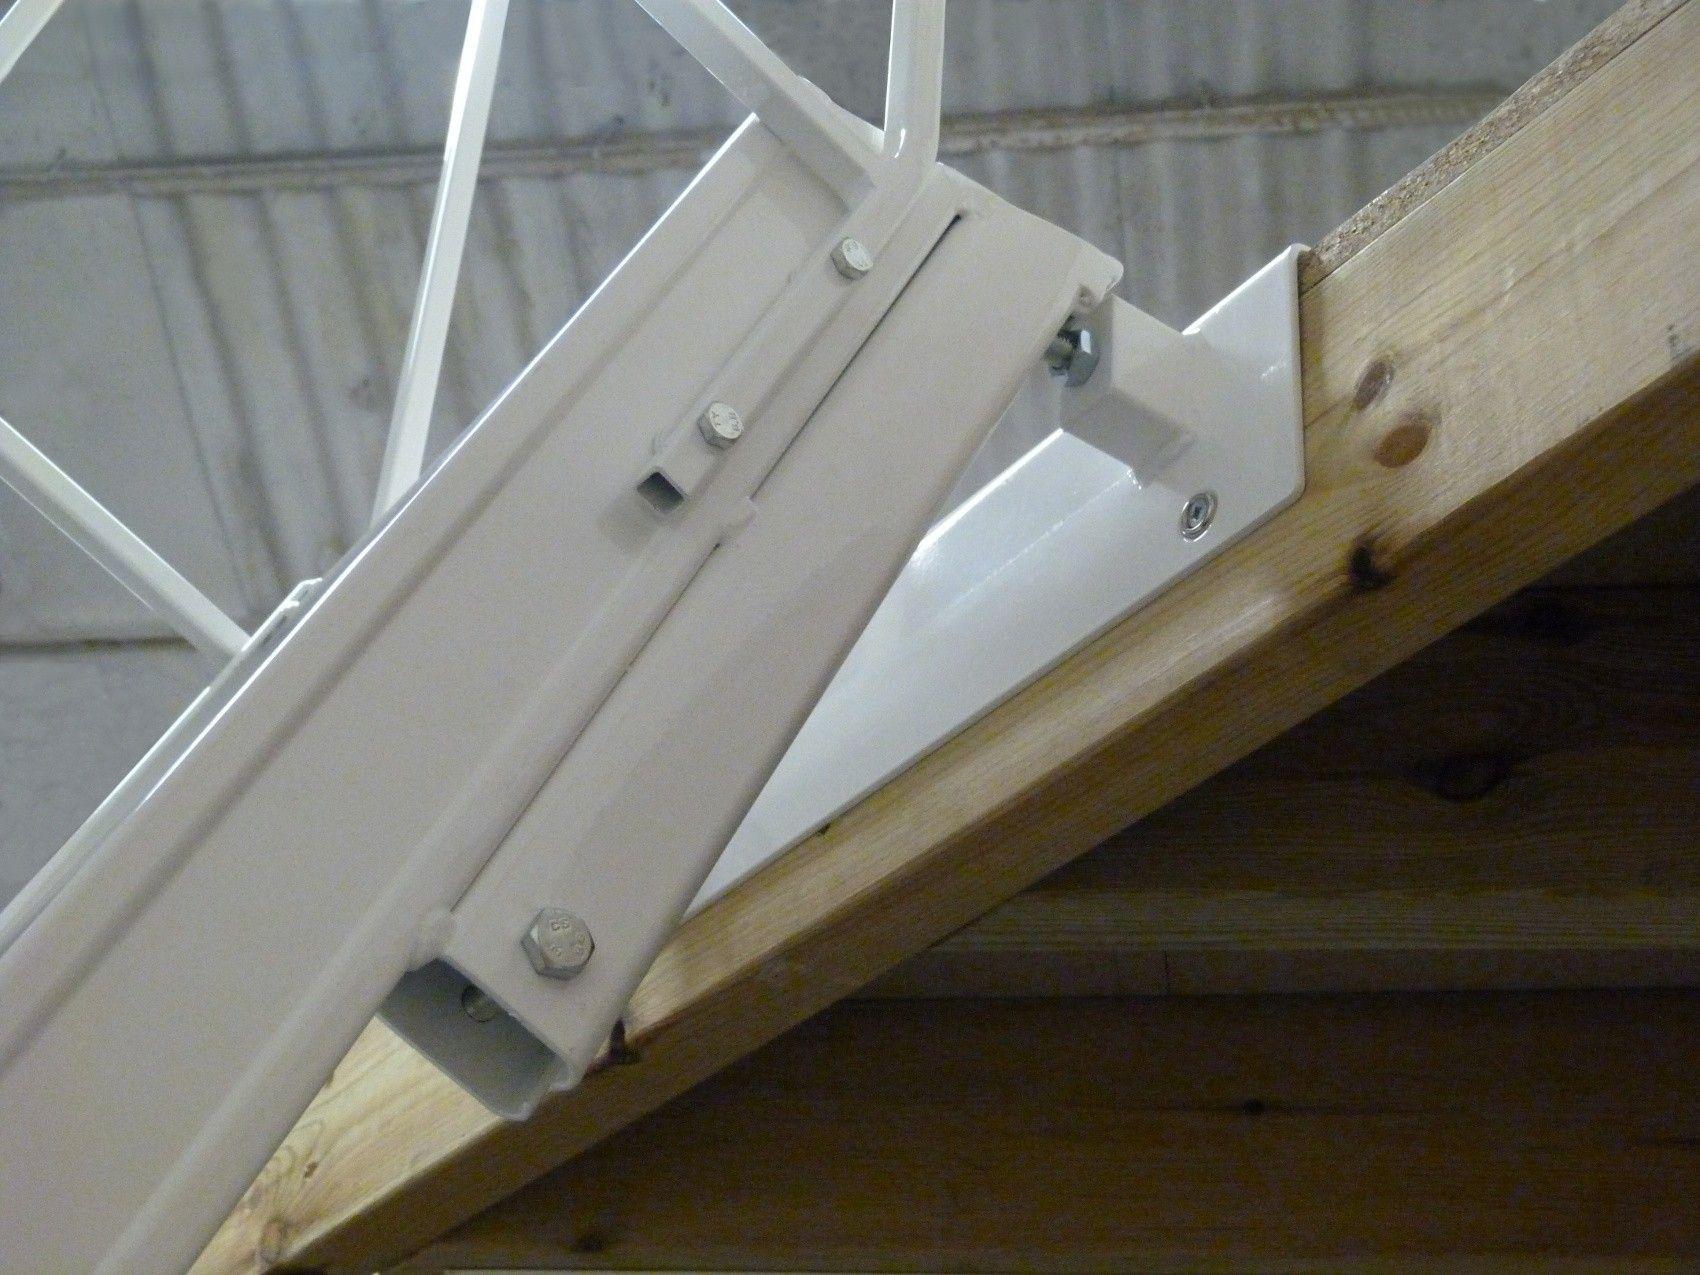 Fixing Plate For Gallery Stairway Stairways Wardrobe Interior Design Stairs Design